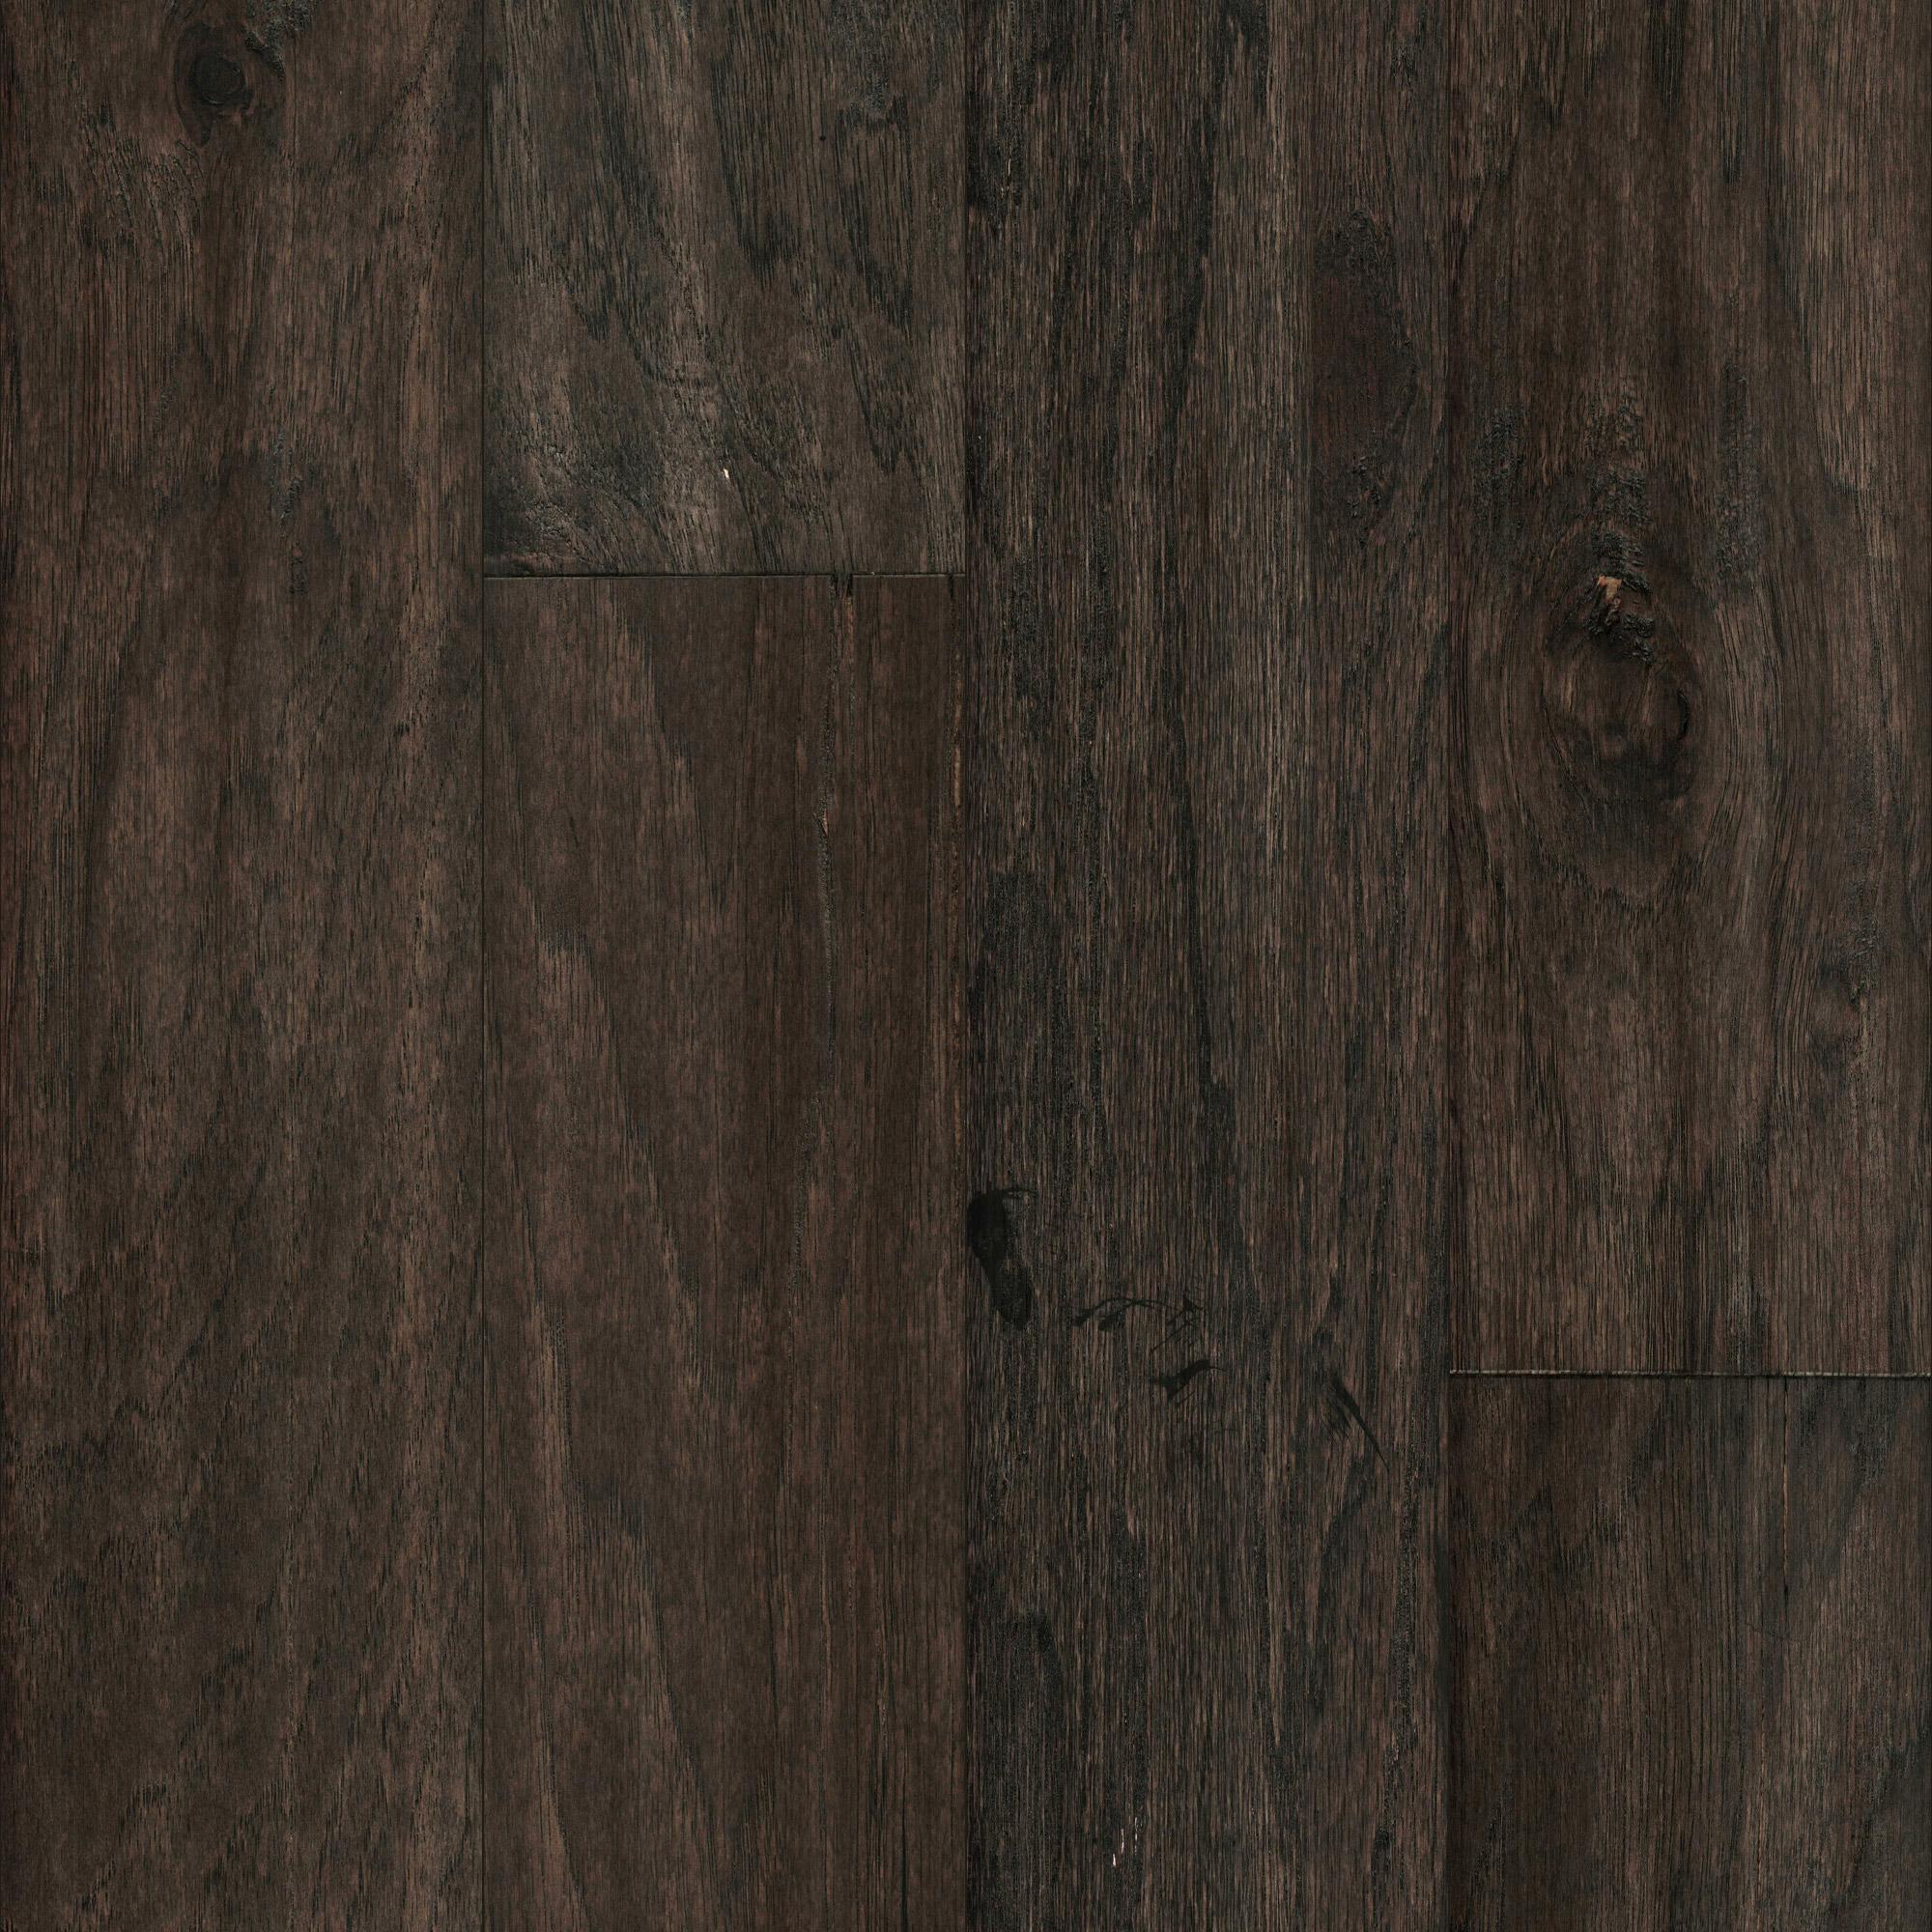 28 Wonderful 3 4 X 2 1 4 Hardwood Flooring 2021 free download 3 4 x 2 1 4 hardwood flooring of mullican lincolnshire sculpted hickory granite 5 engineered inside mullican lincolnshire sculpted hickory granite 5 engineered hardwood flooring